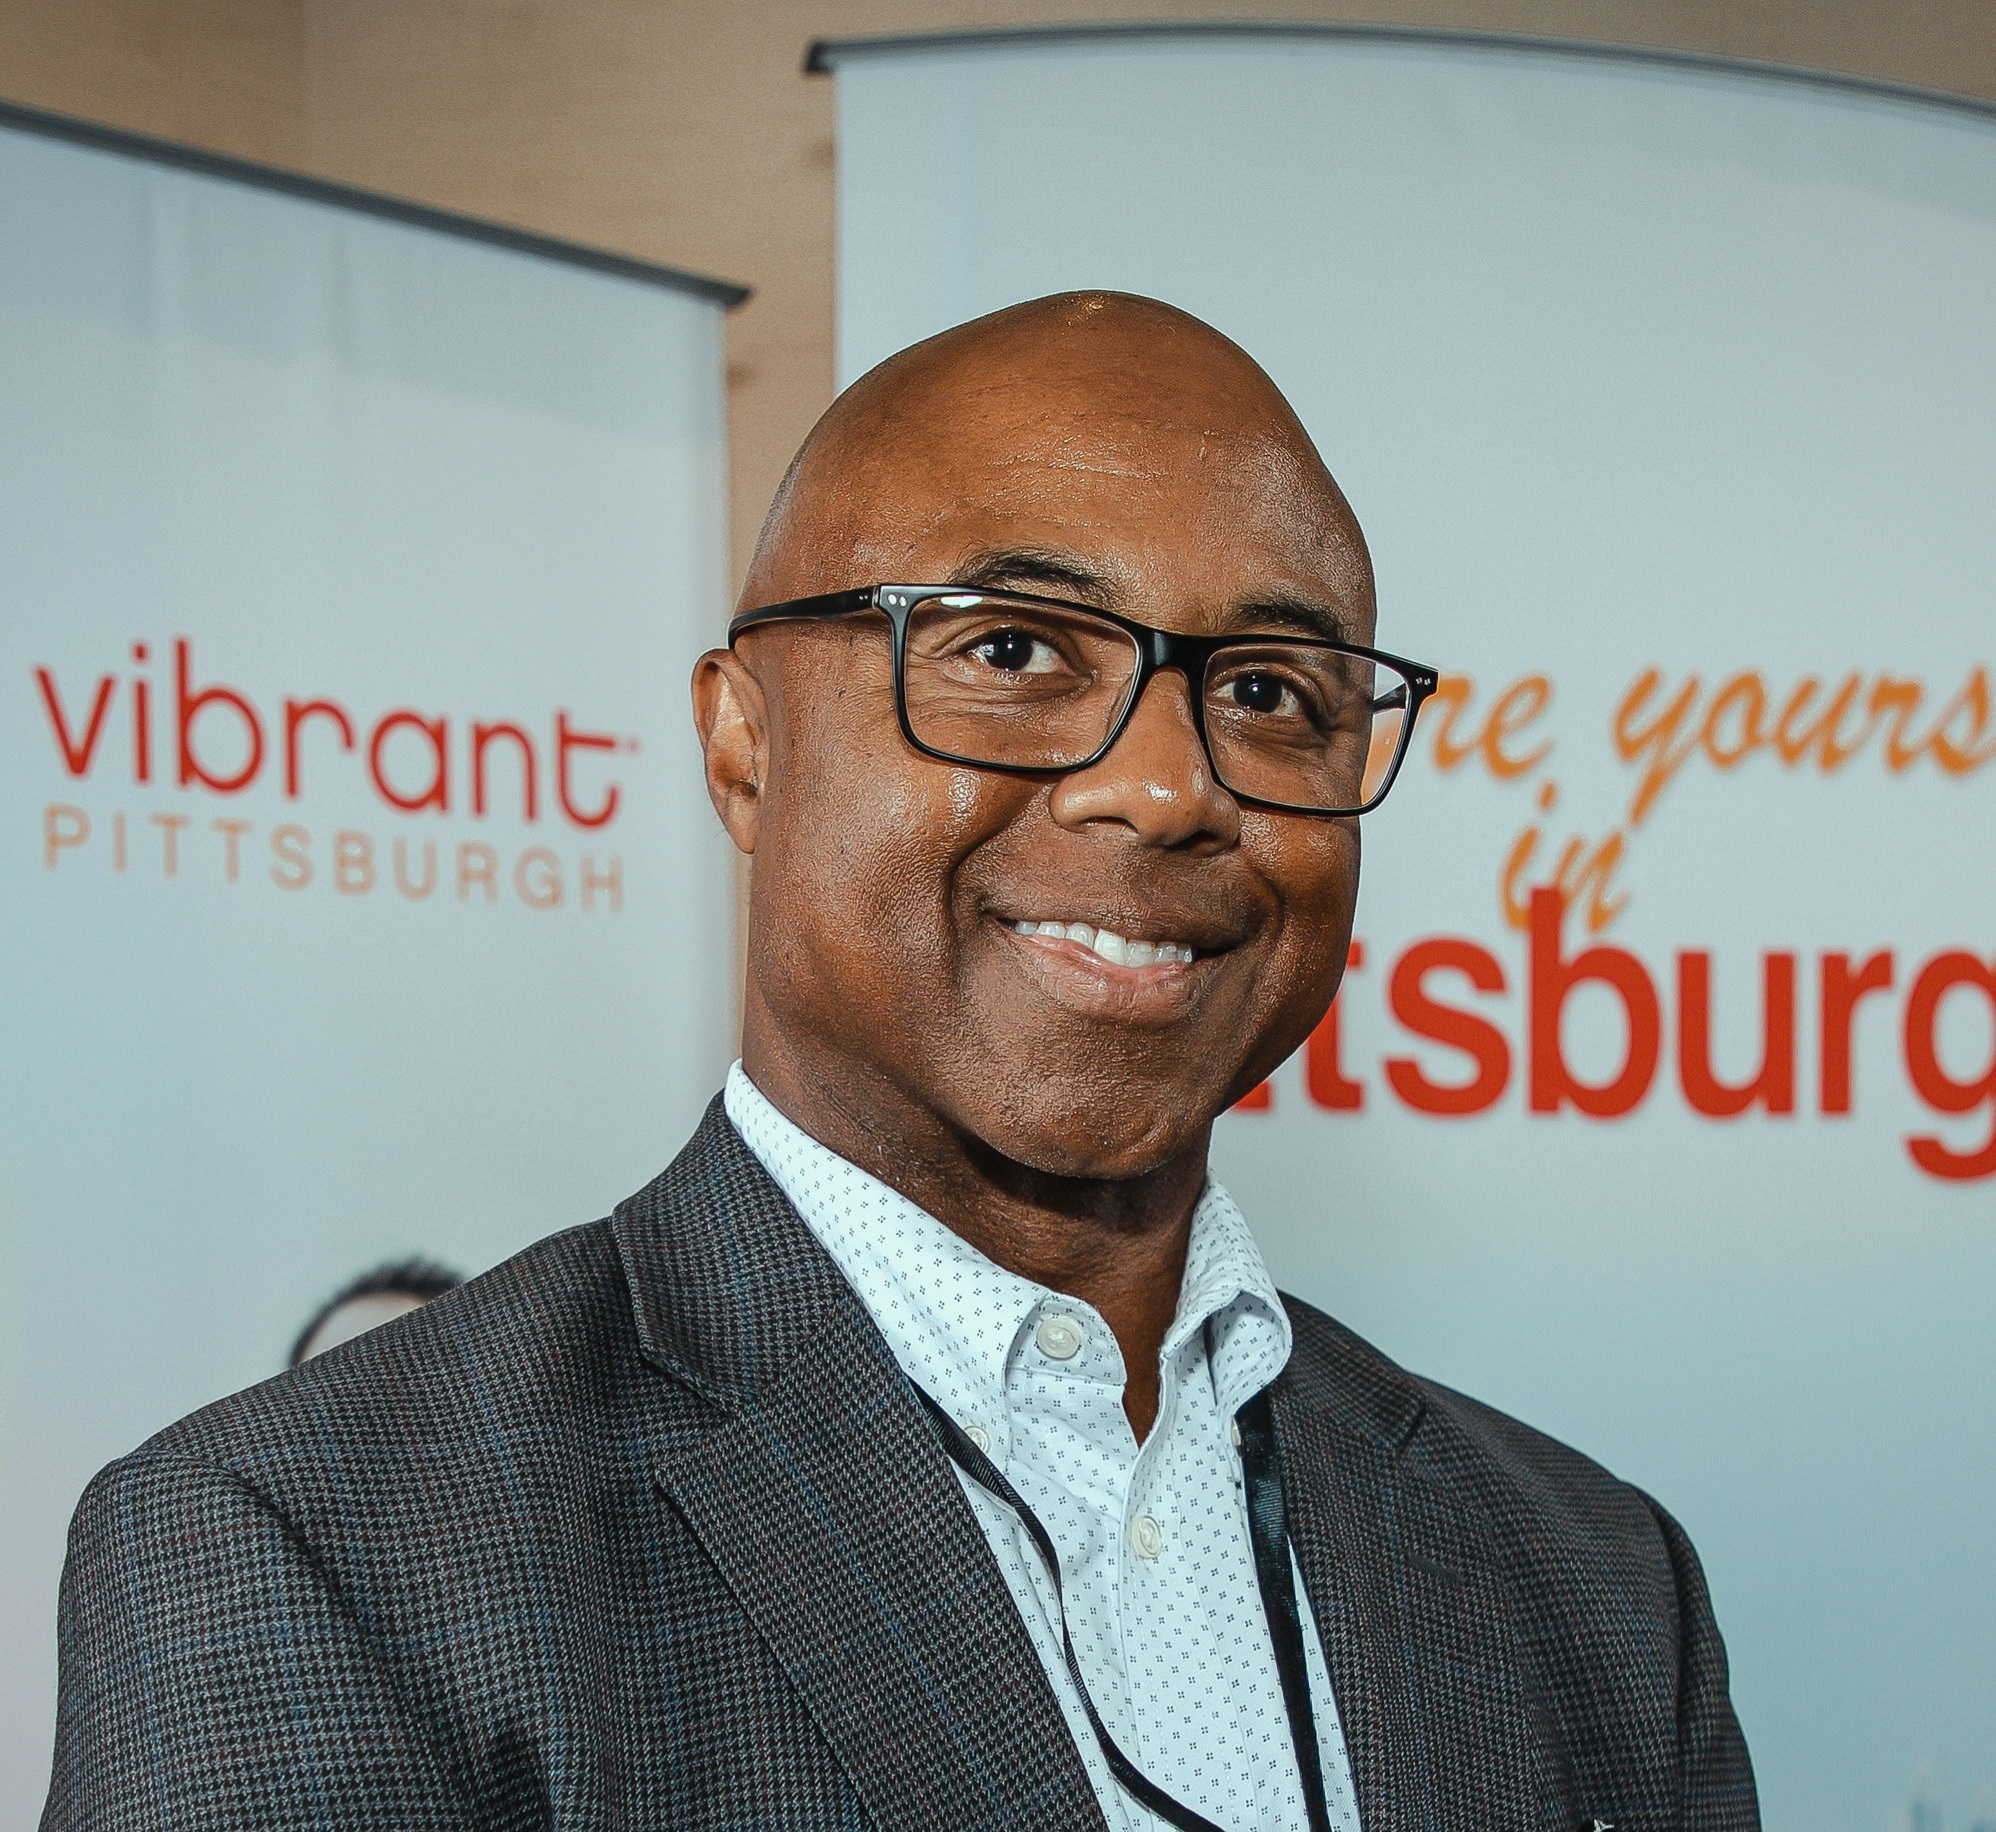 diversity consultant Louis Montgomery Jr